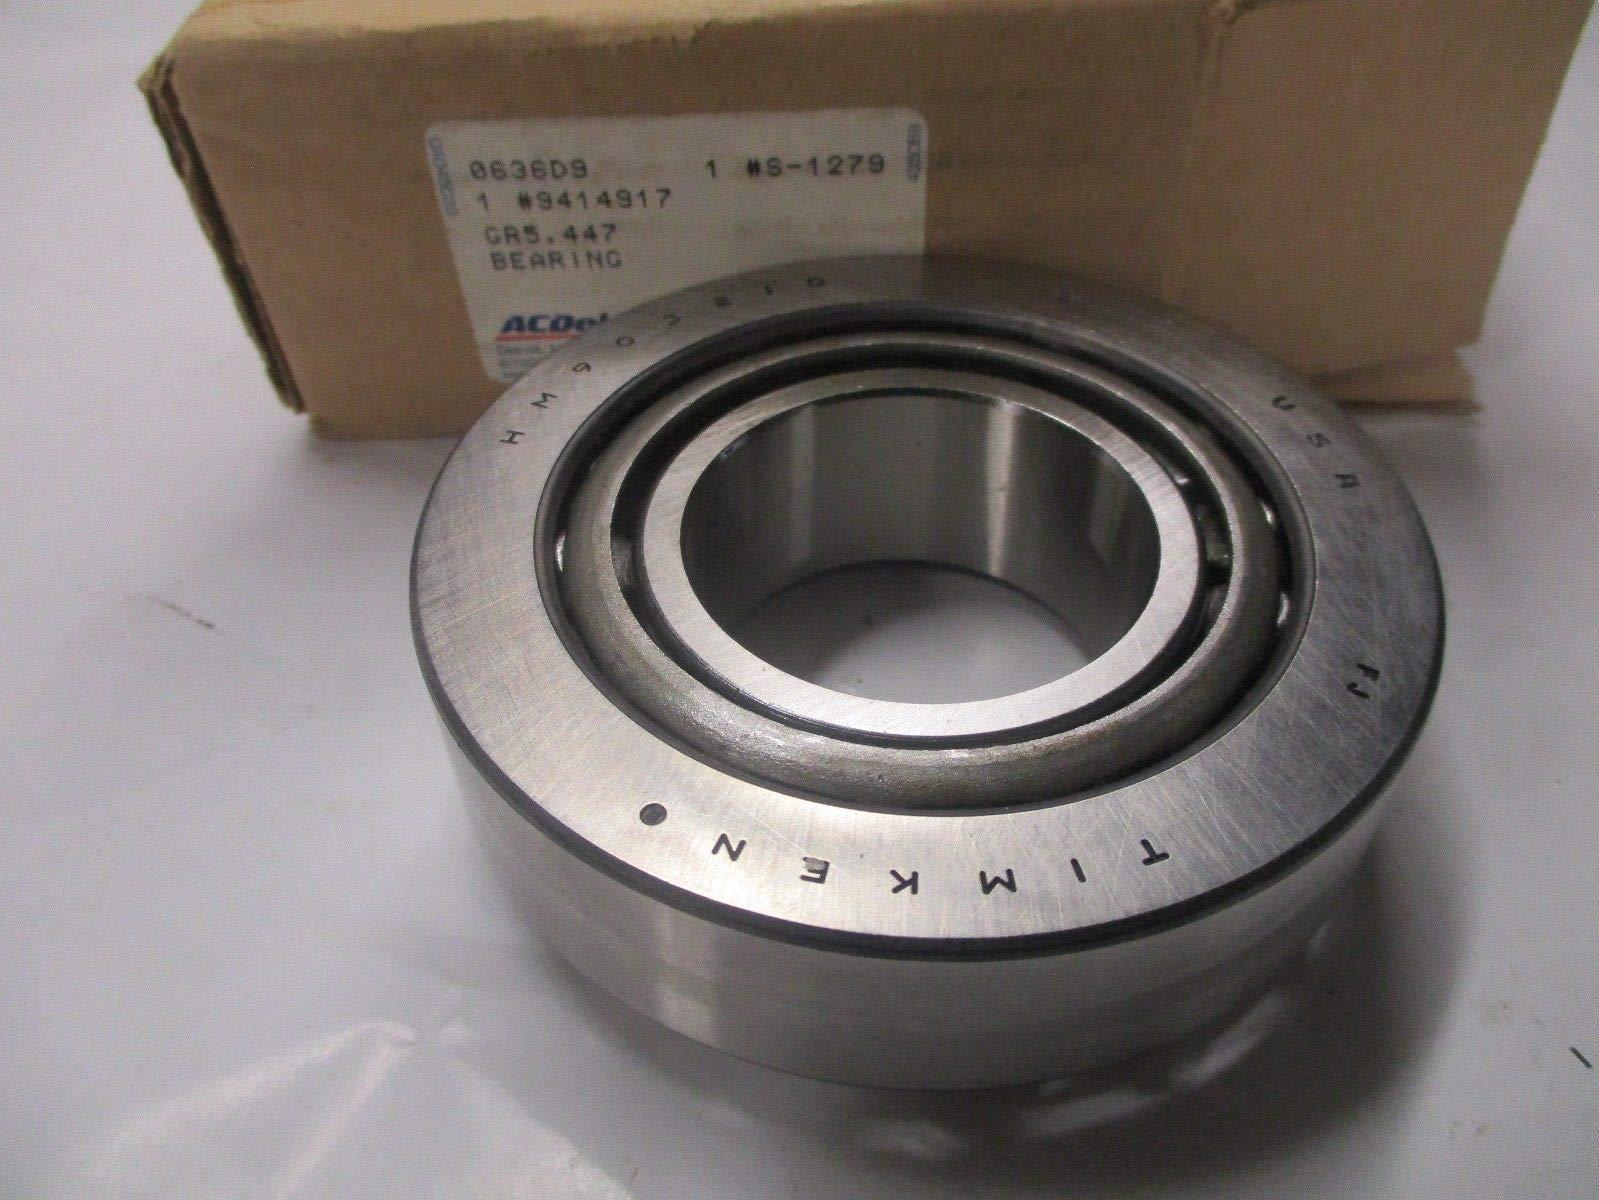 General Motors 9414917, Differential Pinion Bearing